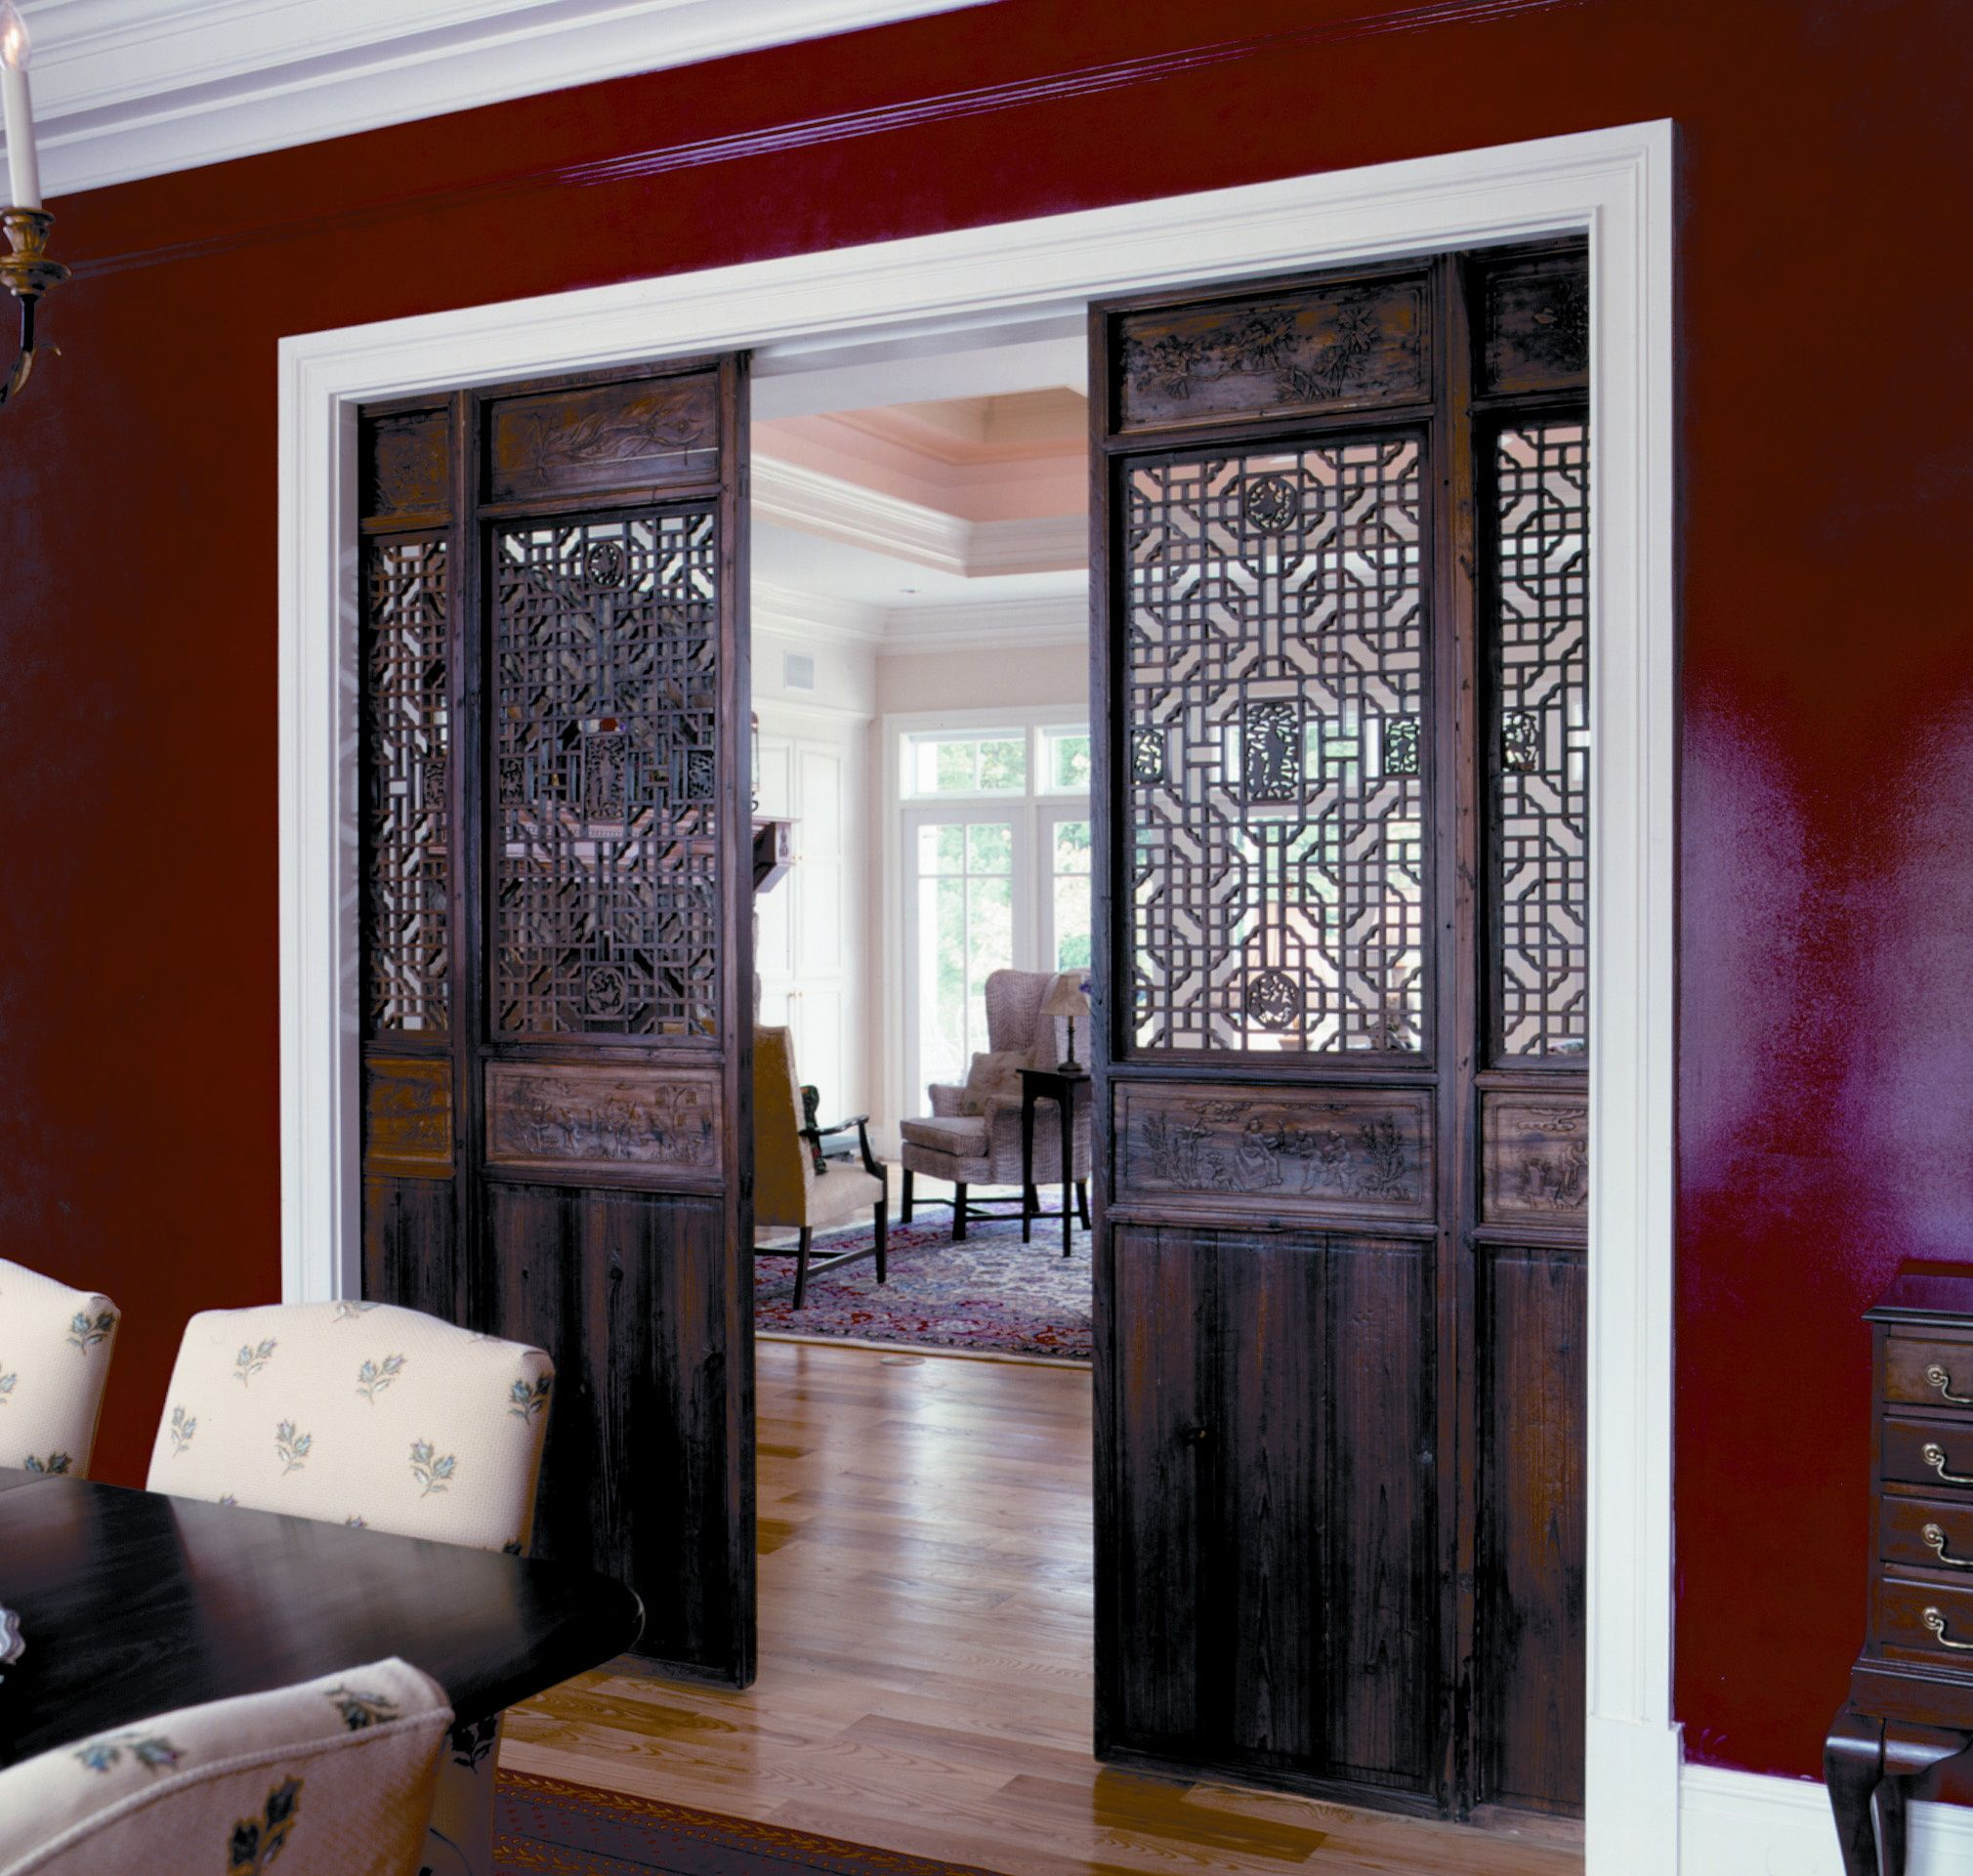 Decorative Interior Door Sliding Door For More Interior Barn Door Treatments See Interiorba Interior Sliding Glass Doors Barn Doors Sliding Log Home Interior